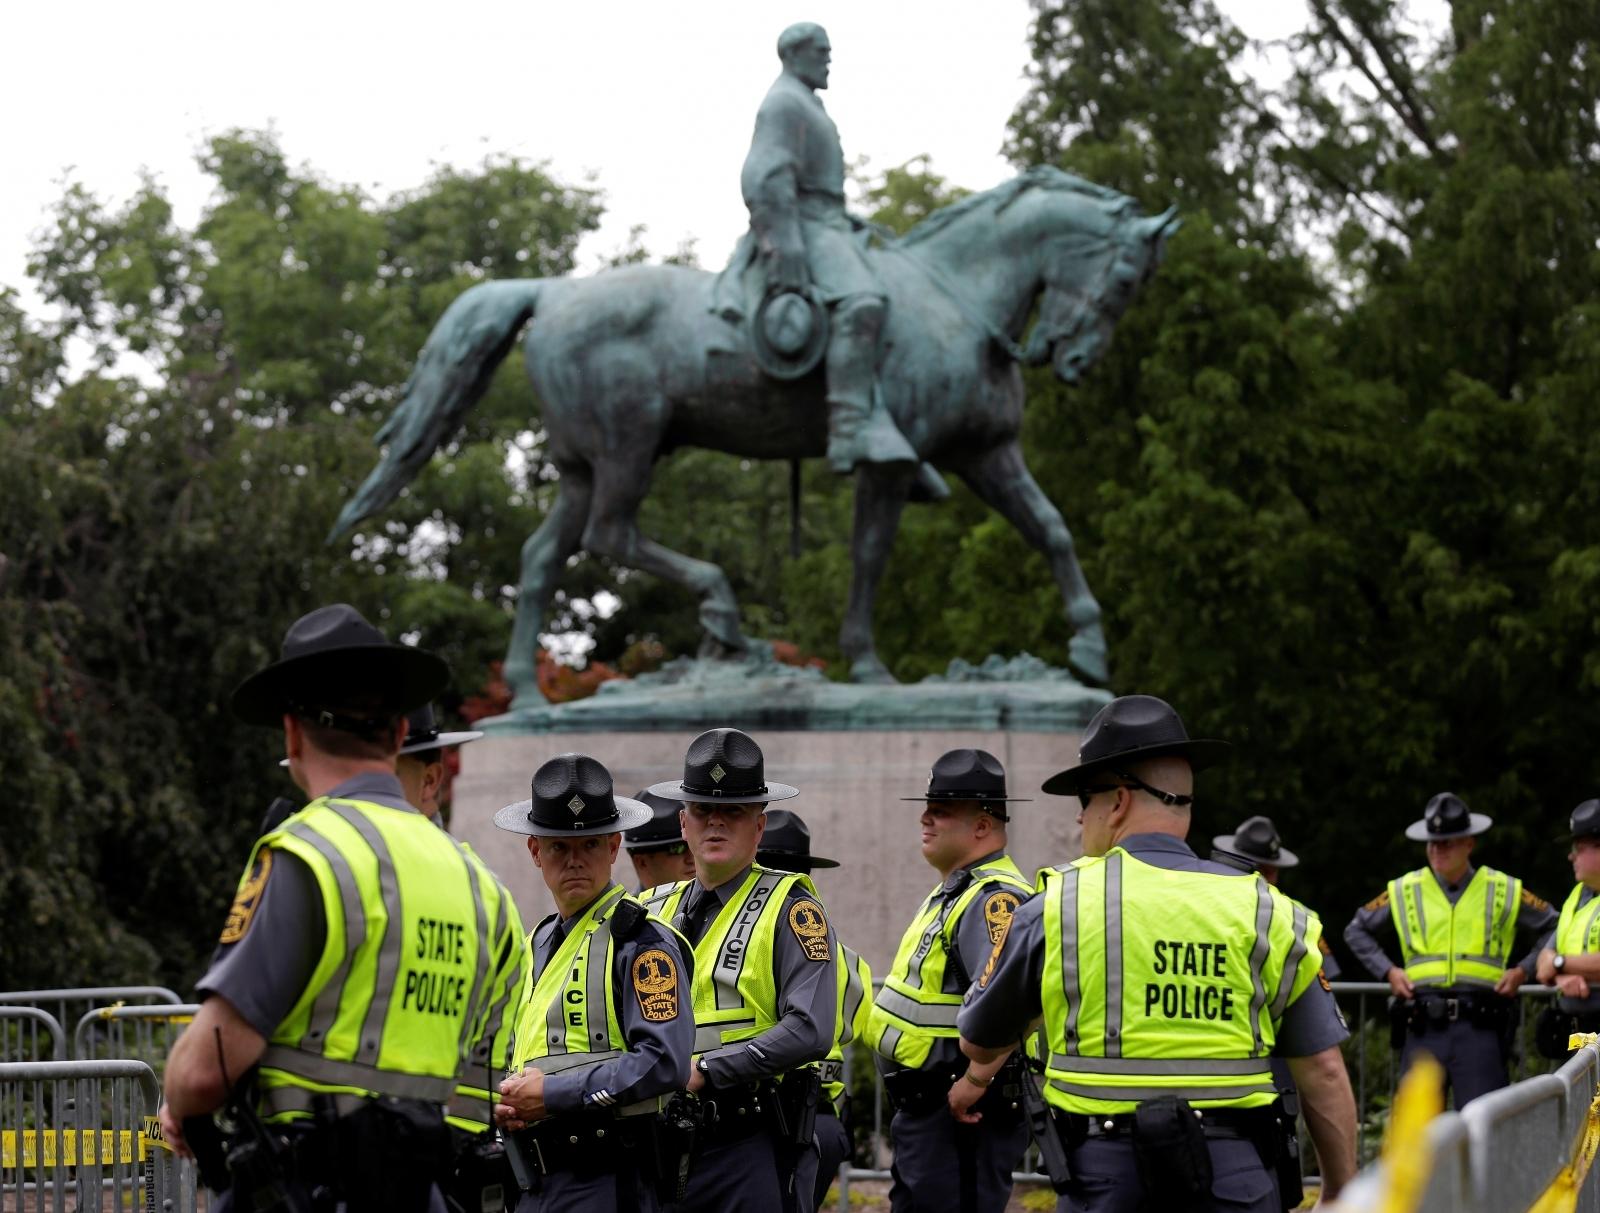 Charlottesville Virginia General Lee White Supremacist